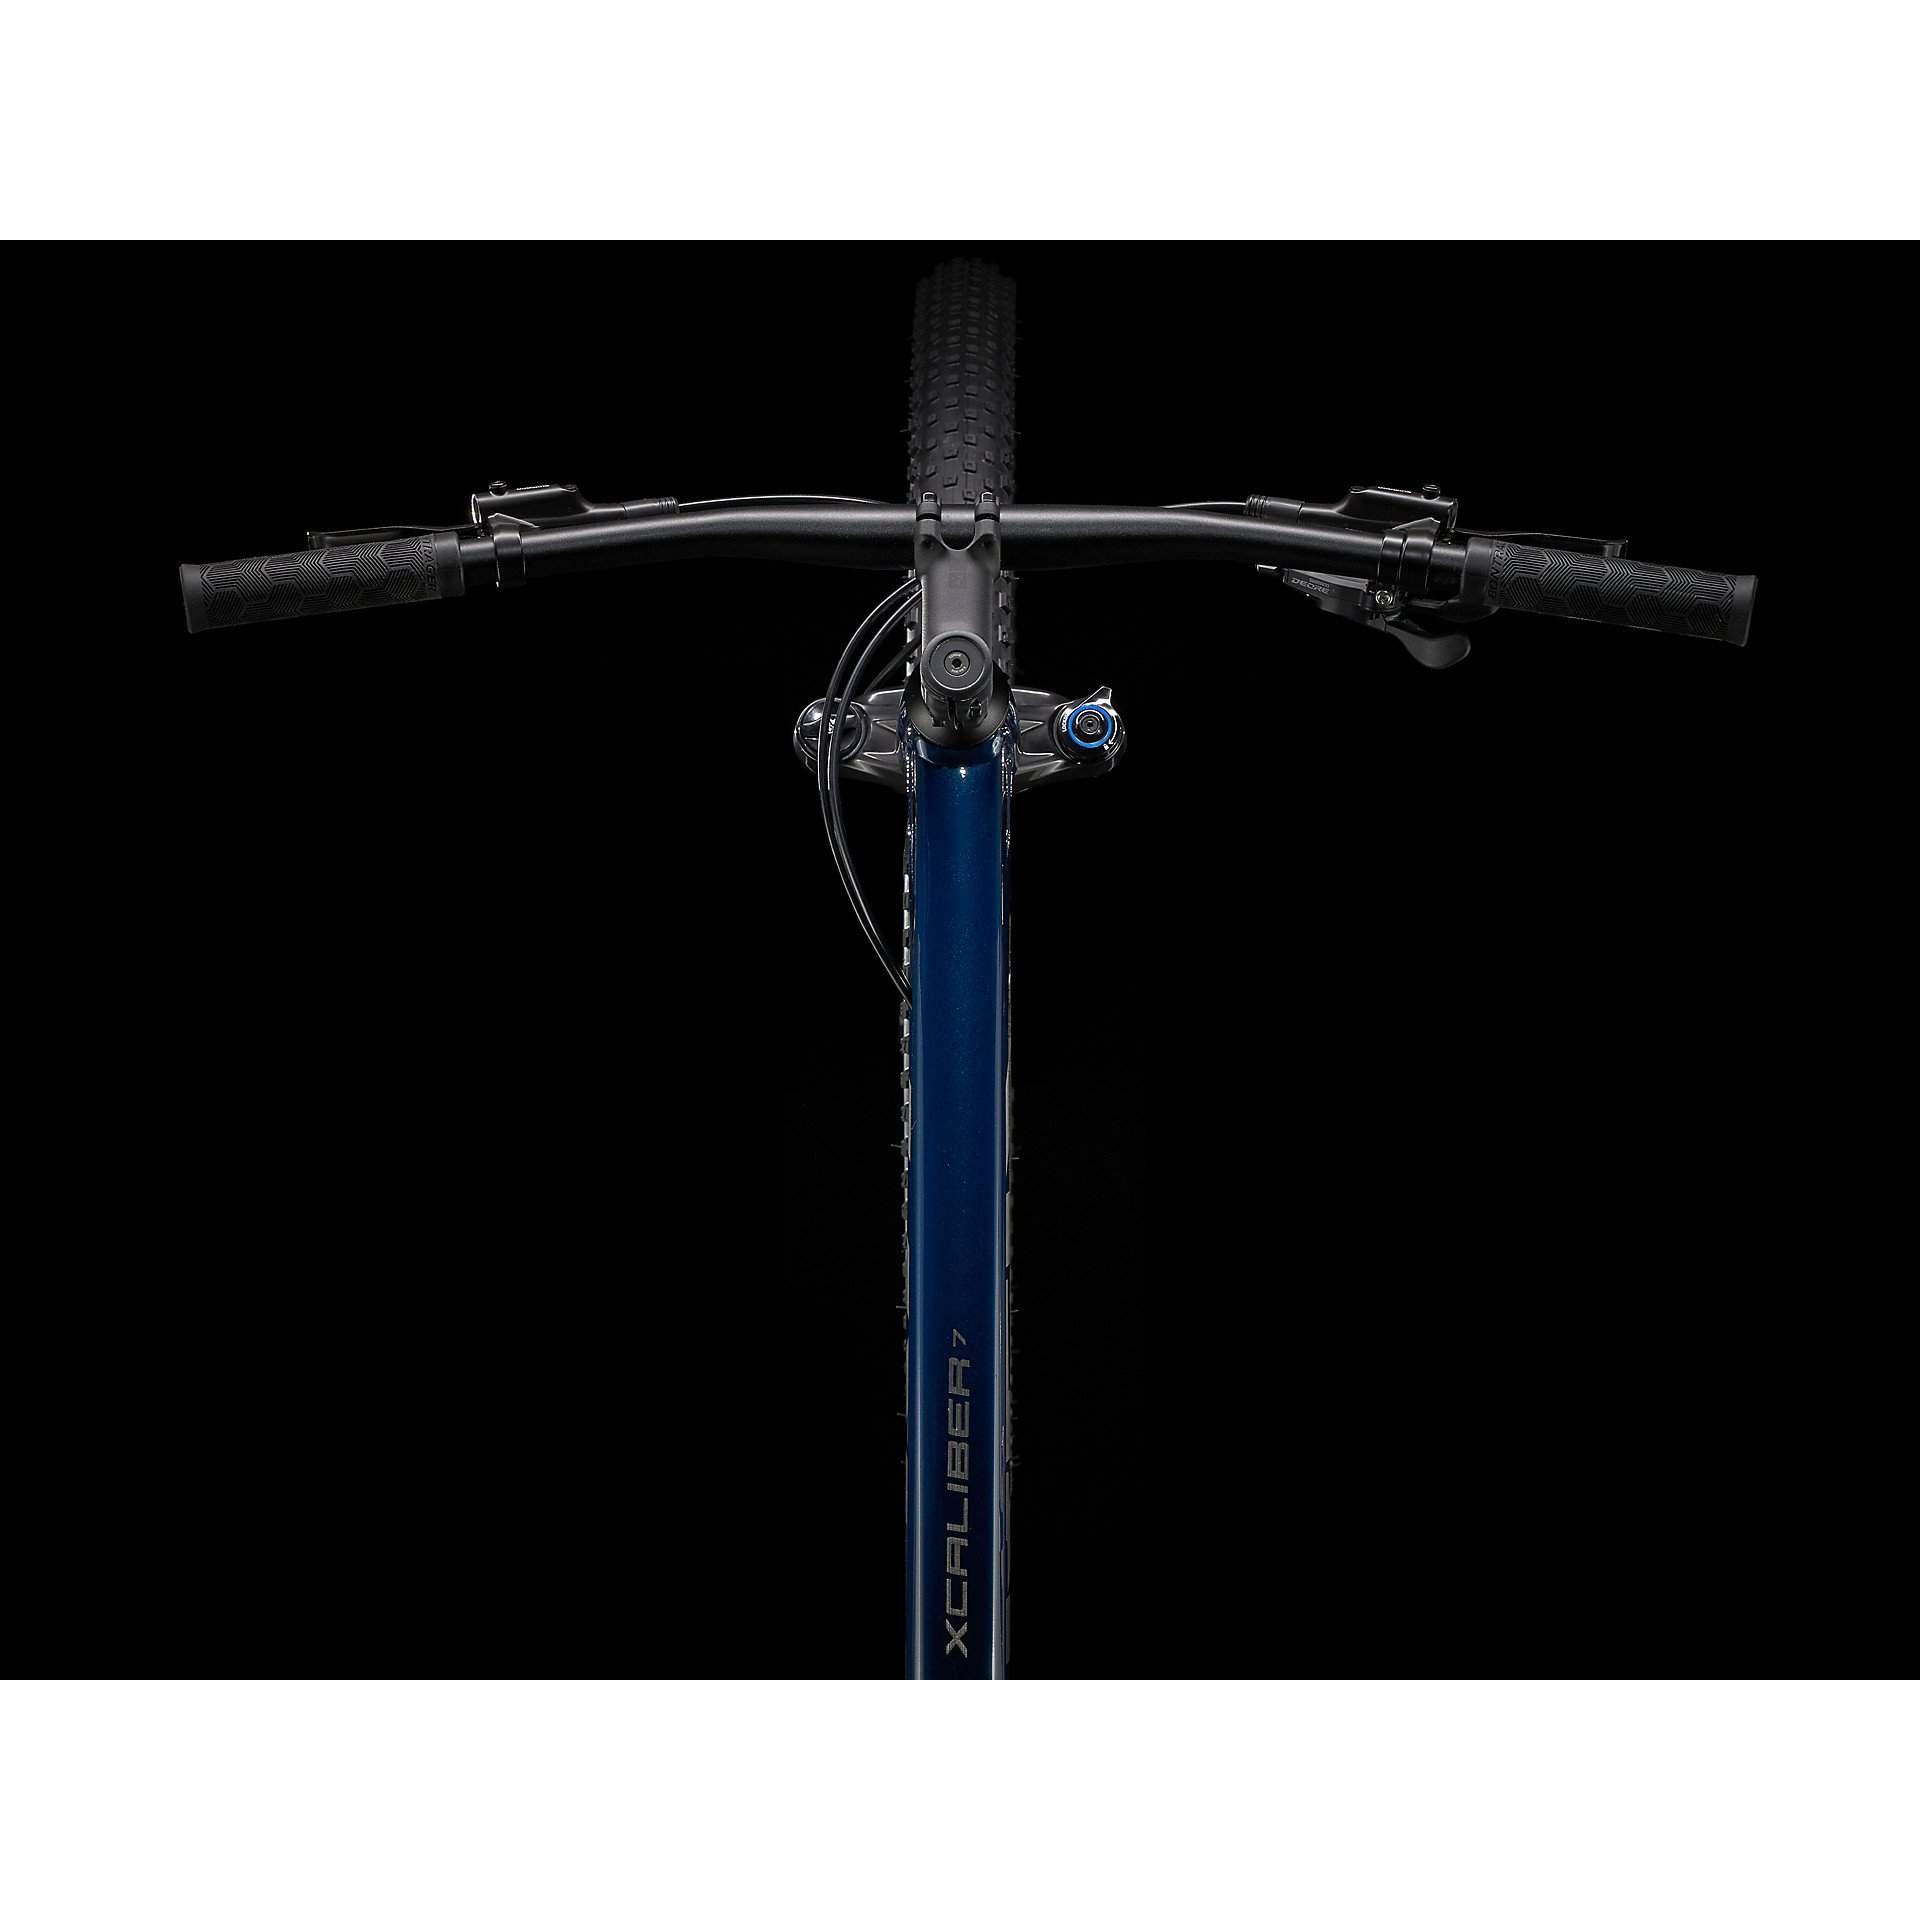 ROWER TREK X-CALIBER 7 MULSANNE BLUE|ANTHRACITE 92